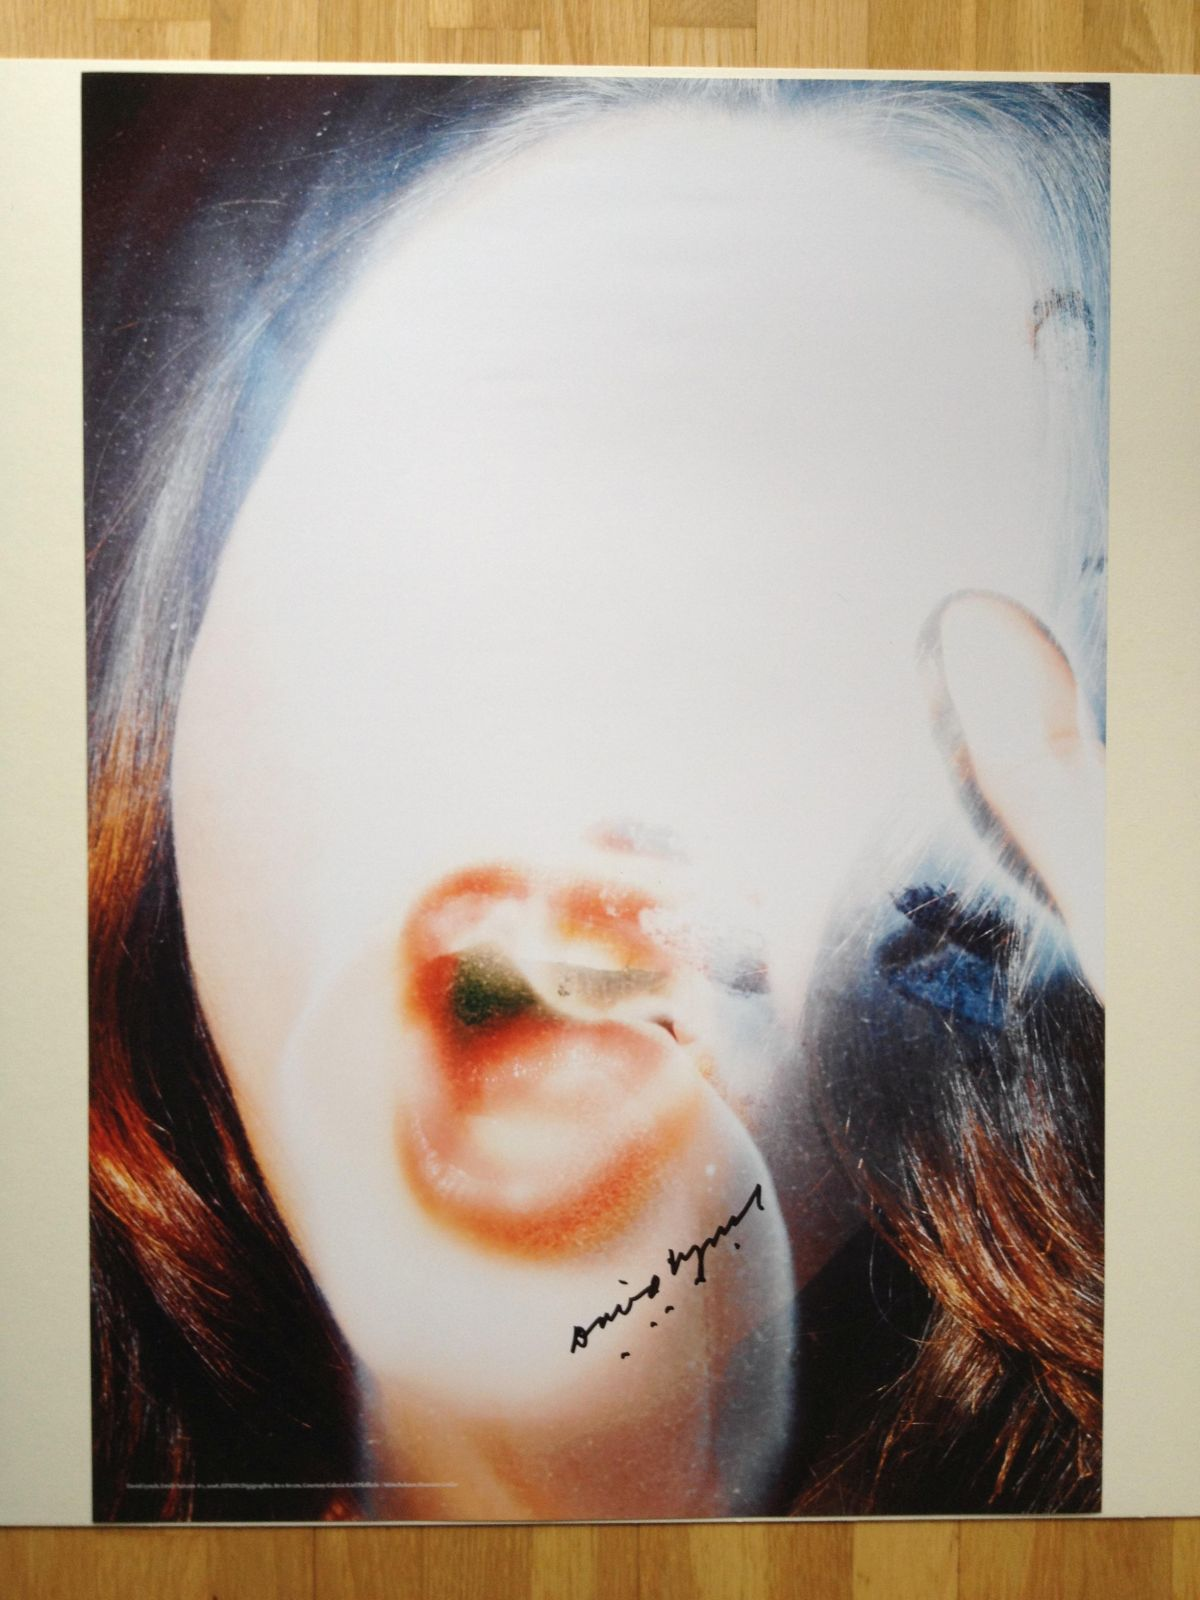 David Lynch - Emily Scream #1, 2008/2010, Offsetlithografie kopen? Bied vanaf 300!